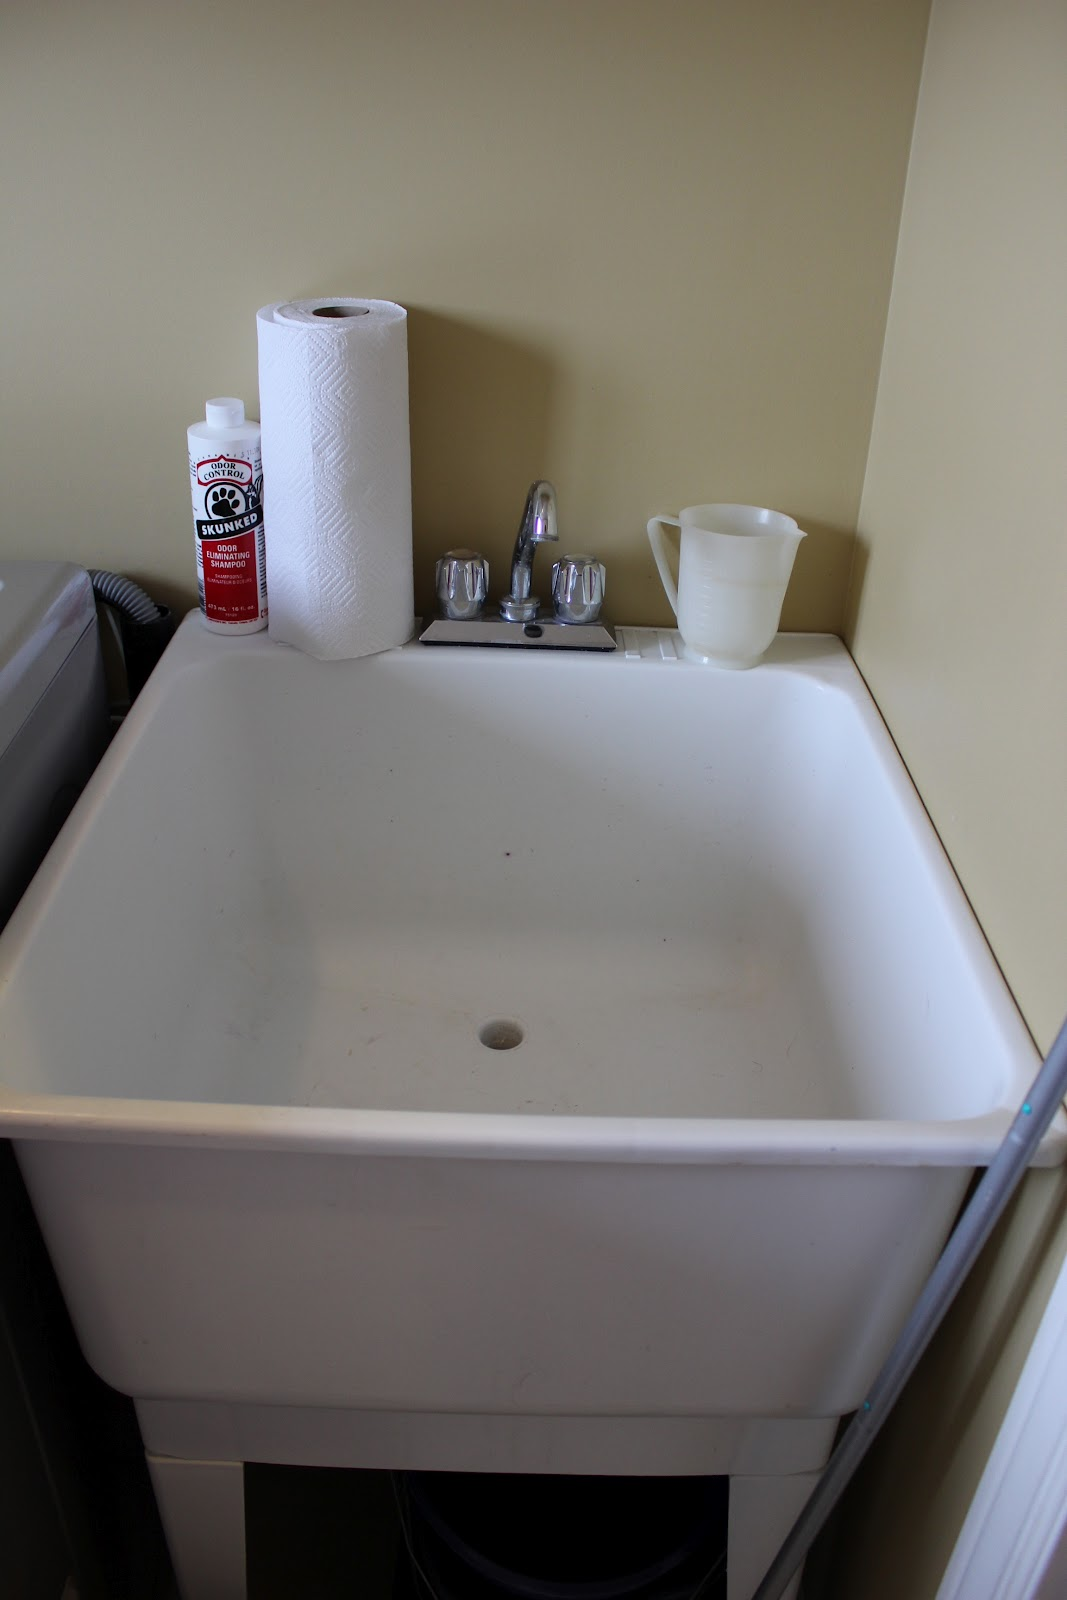 Laundry Sink Costco : Costco Laundry Tub envfusion au css costco laundry tub